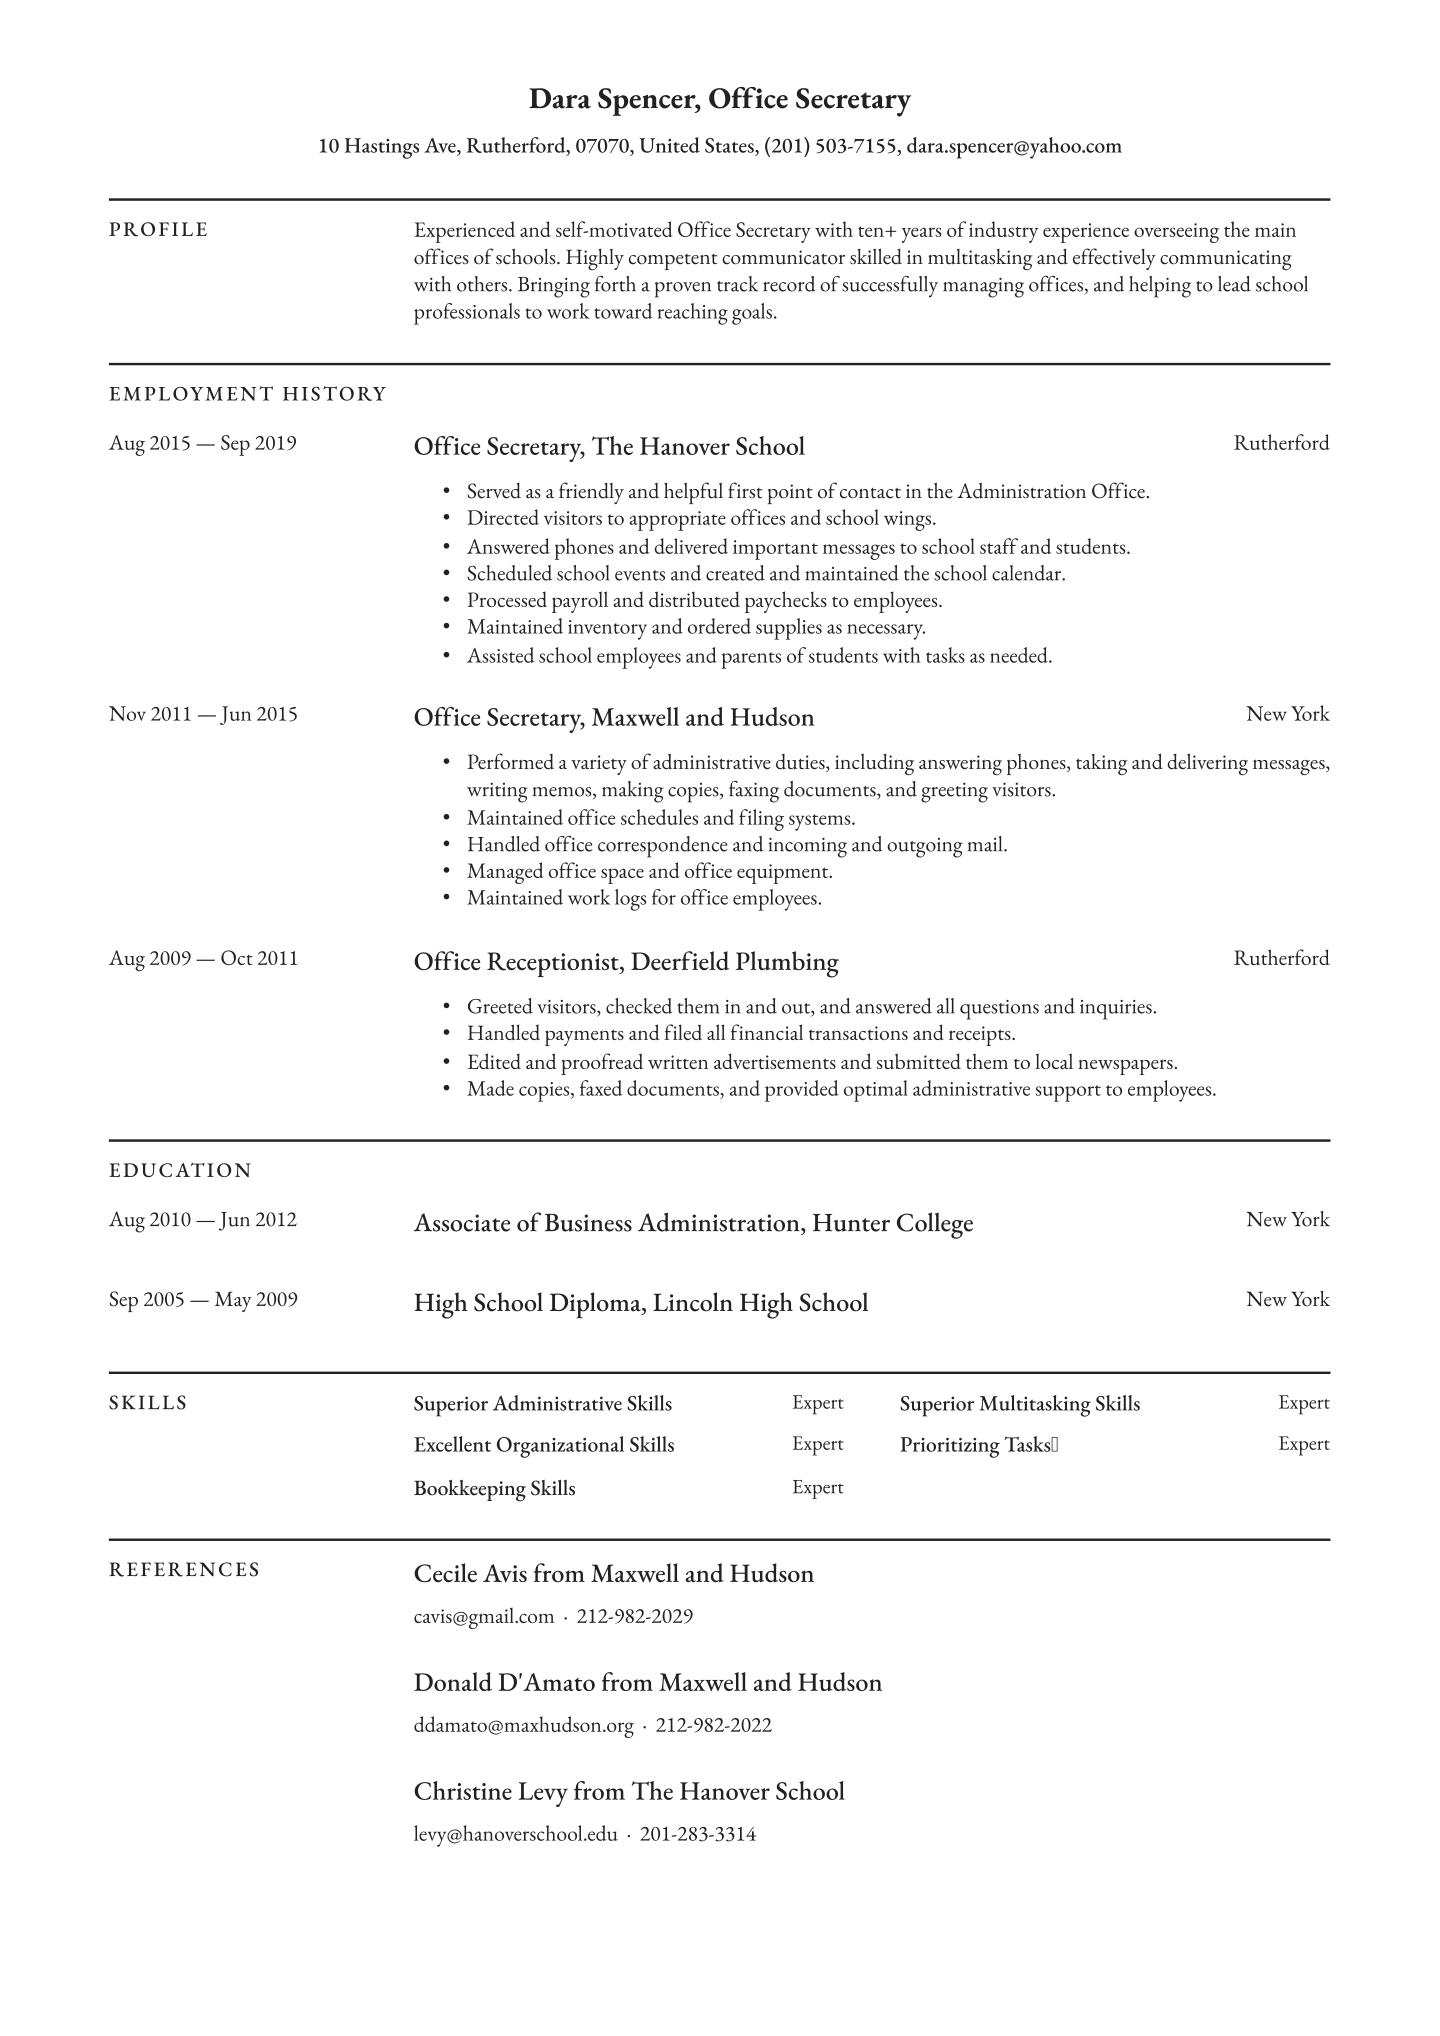 Office Secretary Resume Examples Full Guide 2020 Free Download Resume Io Resume Examples Resume Objective Student Resume Template